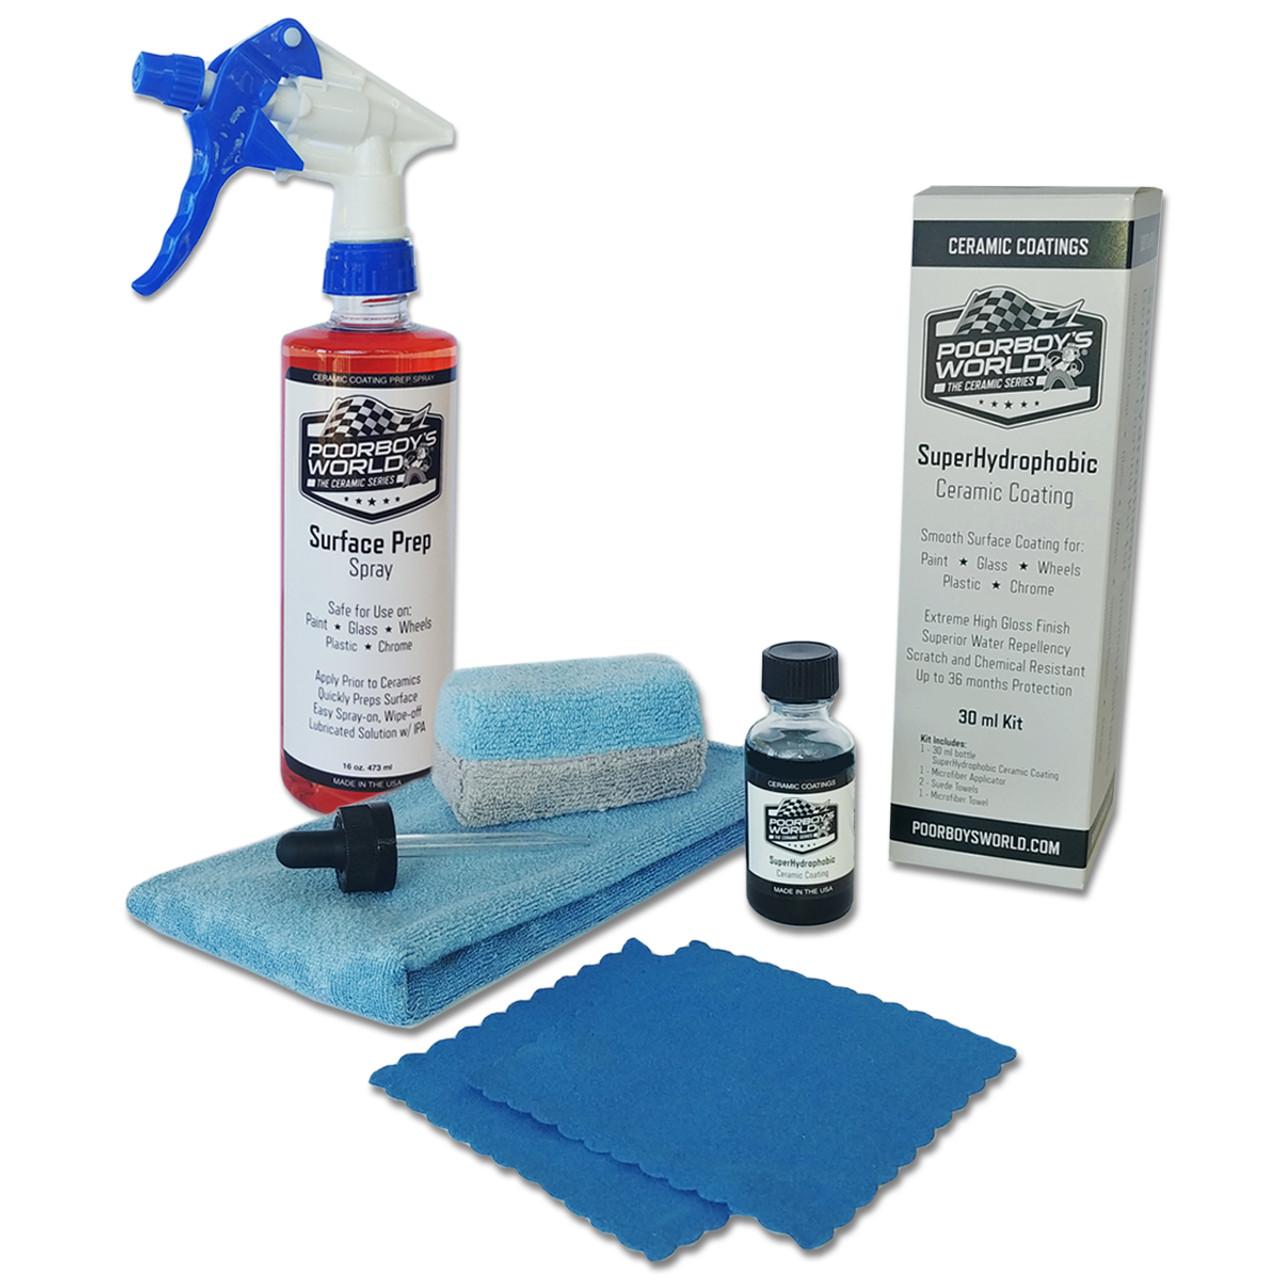 SuperHydrophobic Ceramic Coating 30 ml Kit PLUS 16 oz Surface Prep w/ Sprayer